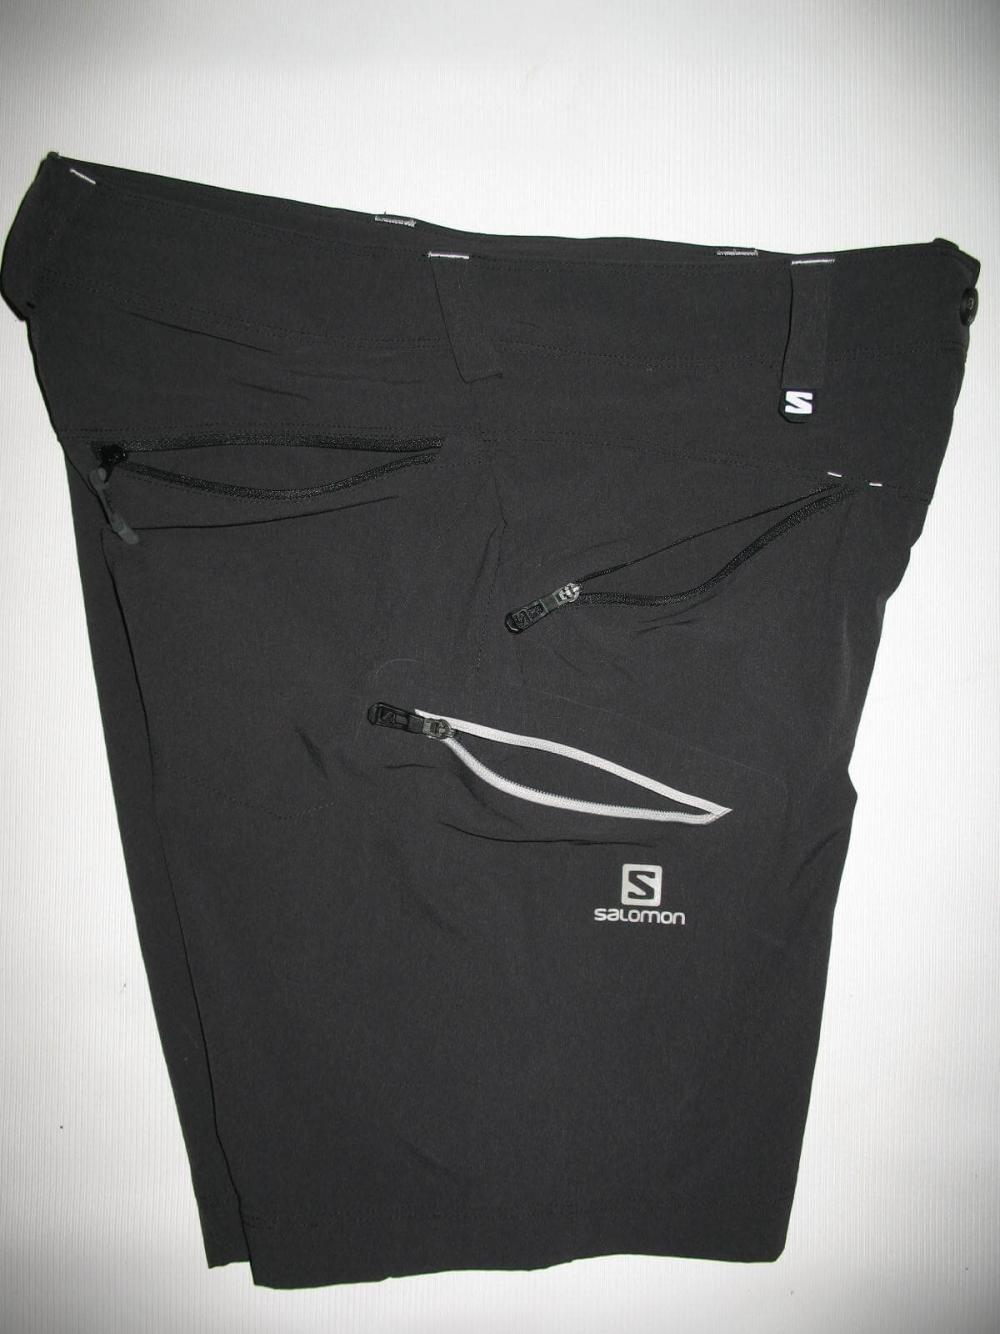 Шорты SALOMON Wayfarer shorts lady (размер M/S) - 5